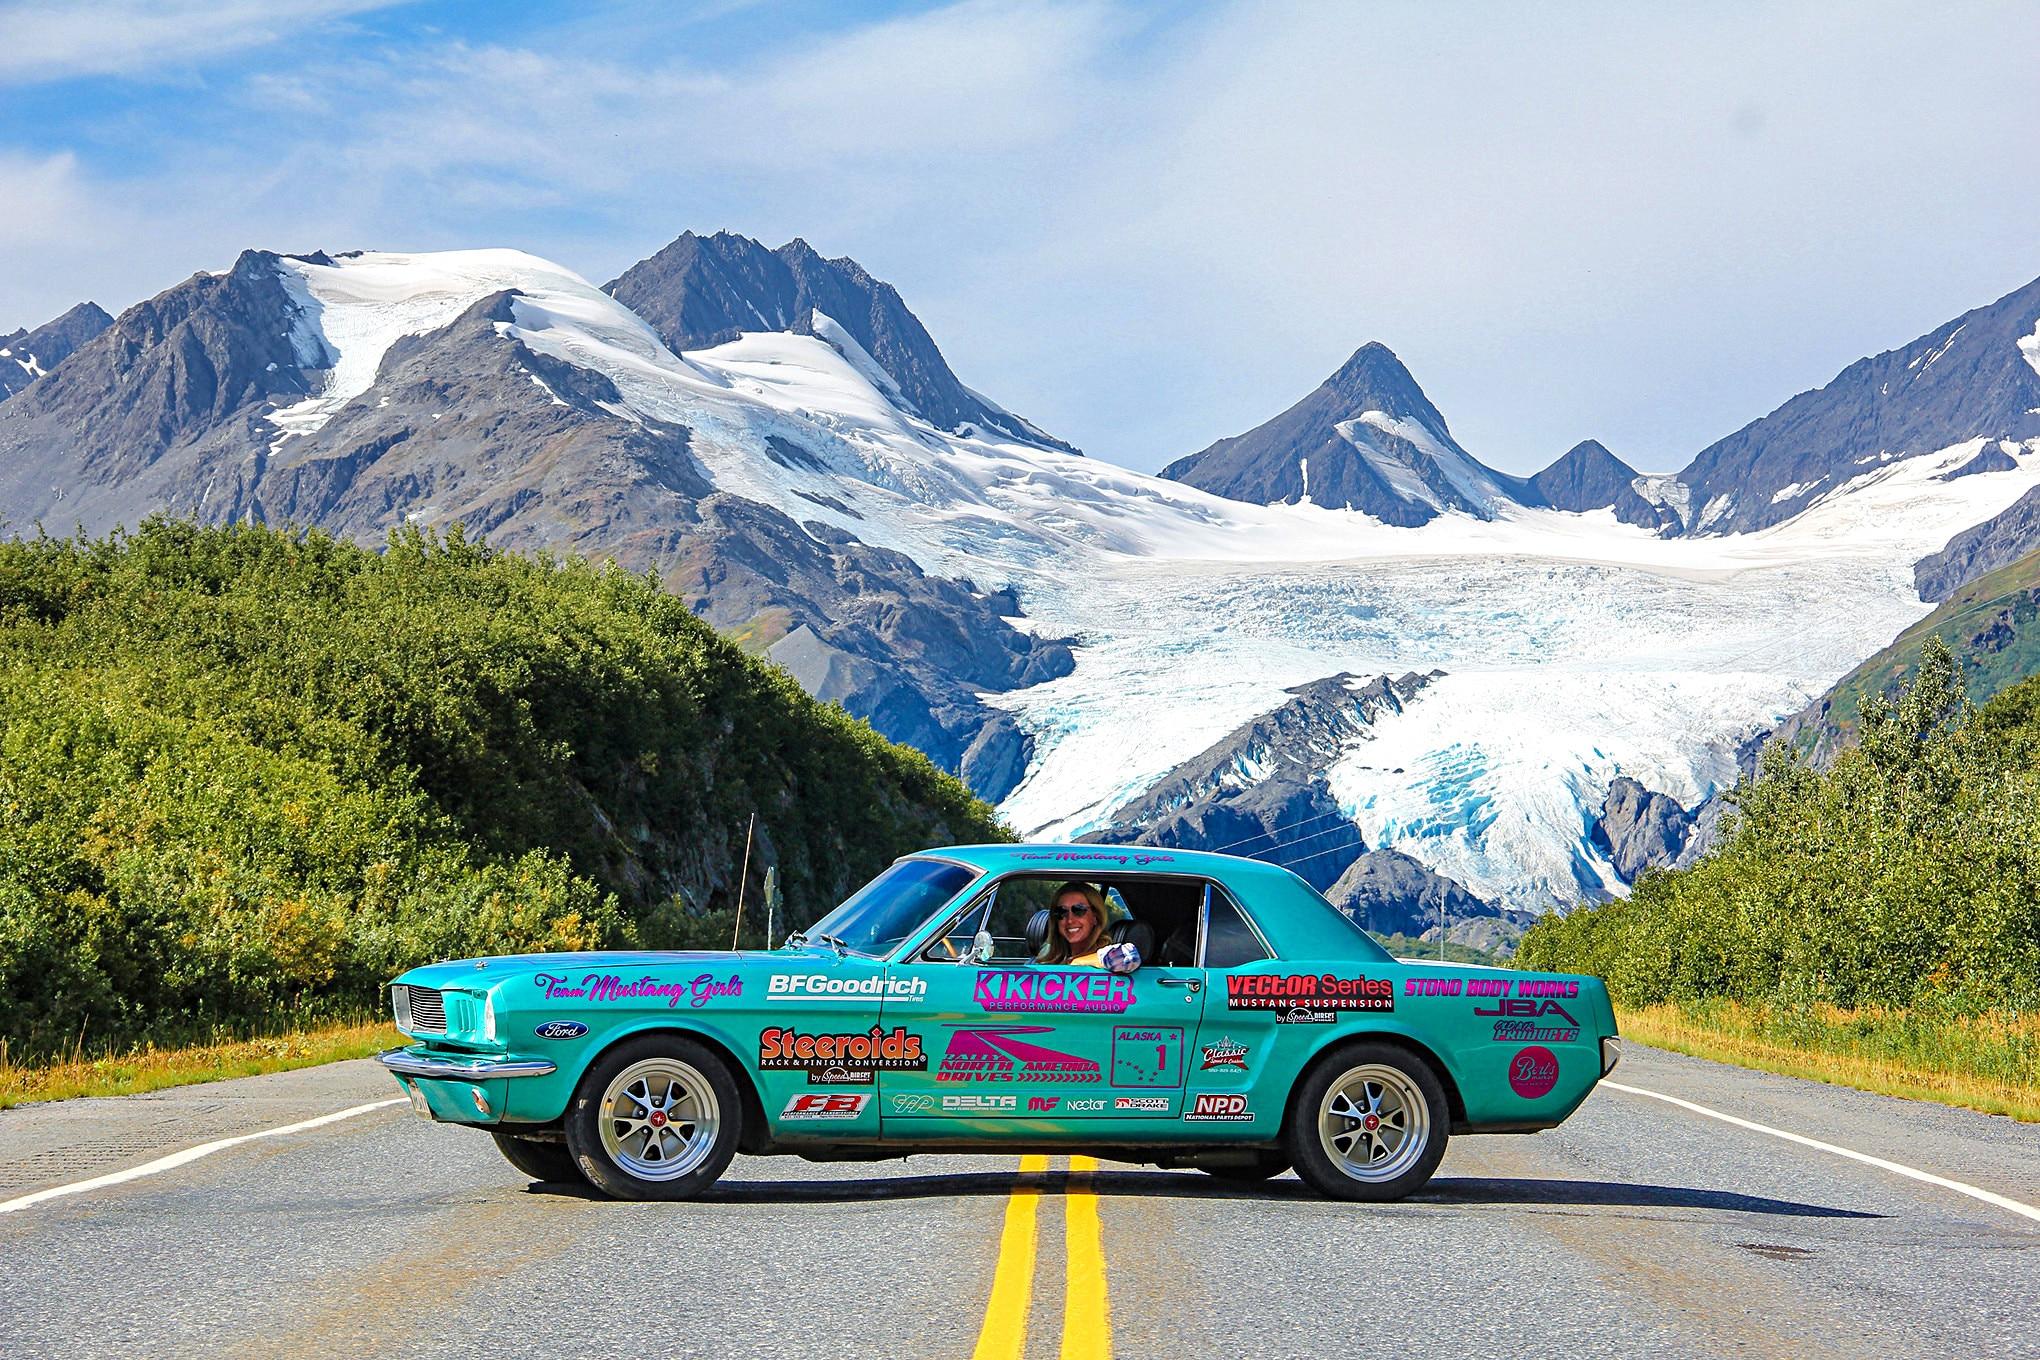 1965 Ford Mustang Alaska Roadtrip Adventure 10